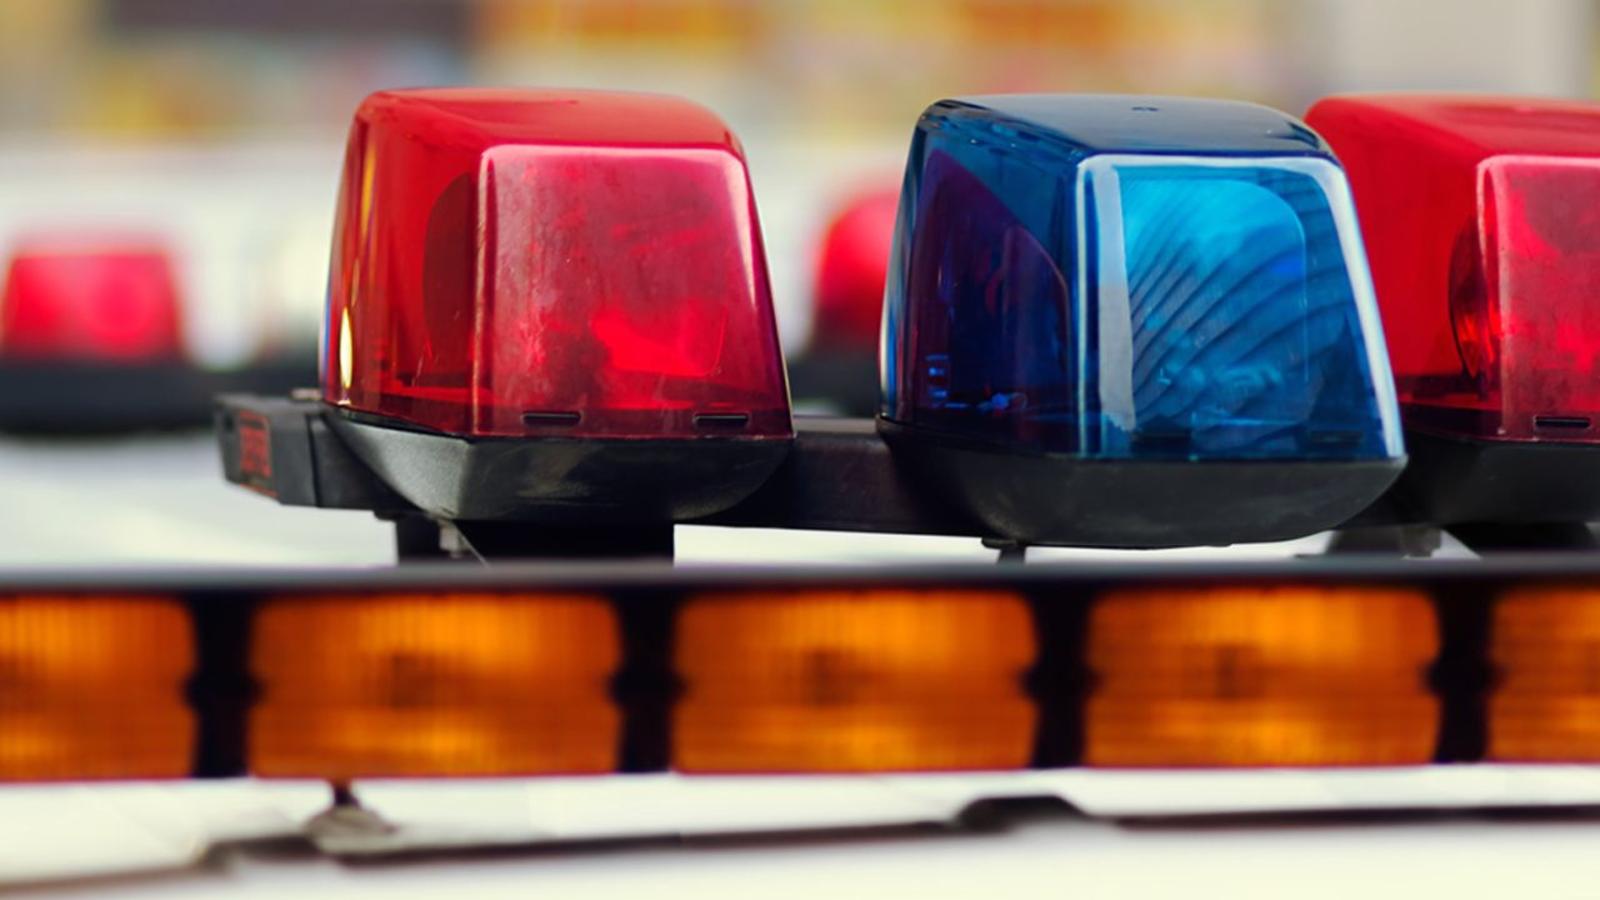 New Jersey man fires gun towards neighbors over loud partying: Police